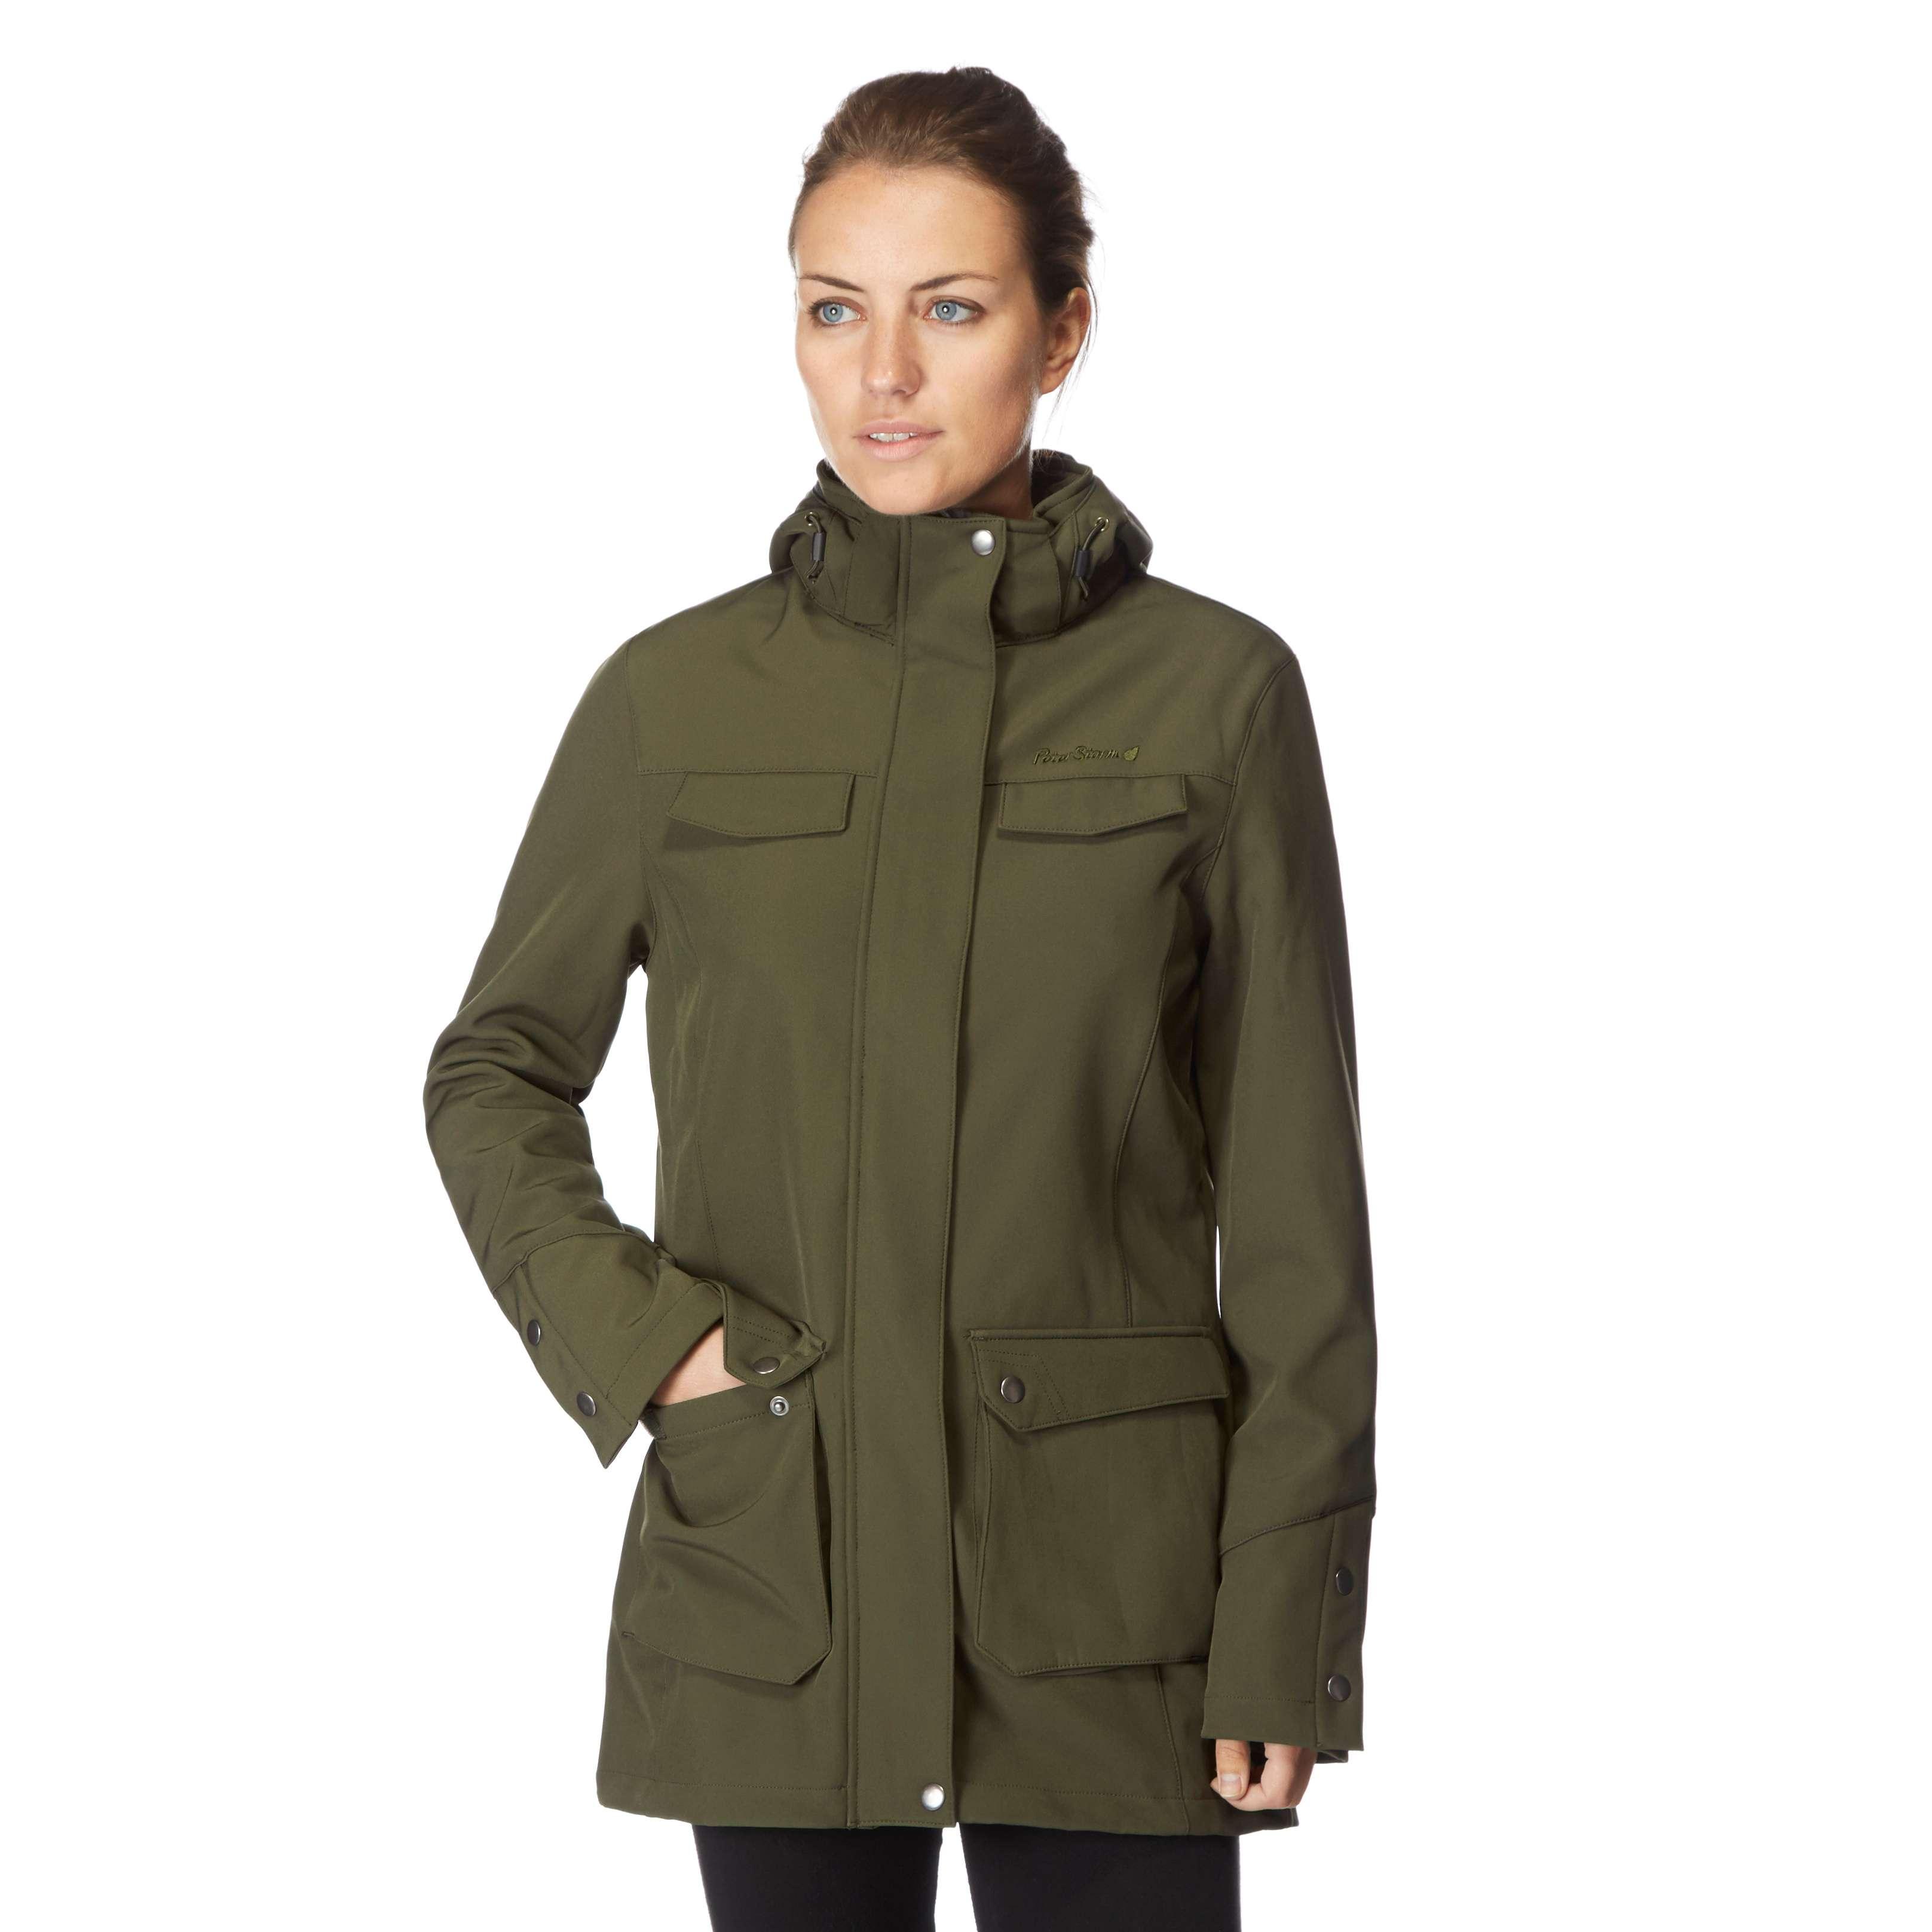 PETER STORM Women's Long Softshell Jacket